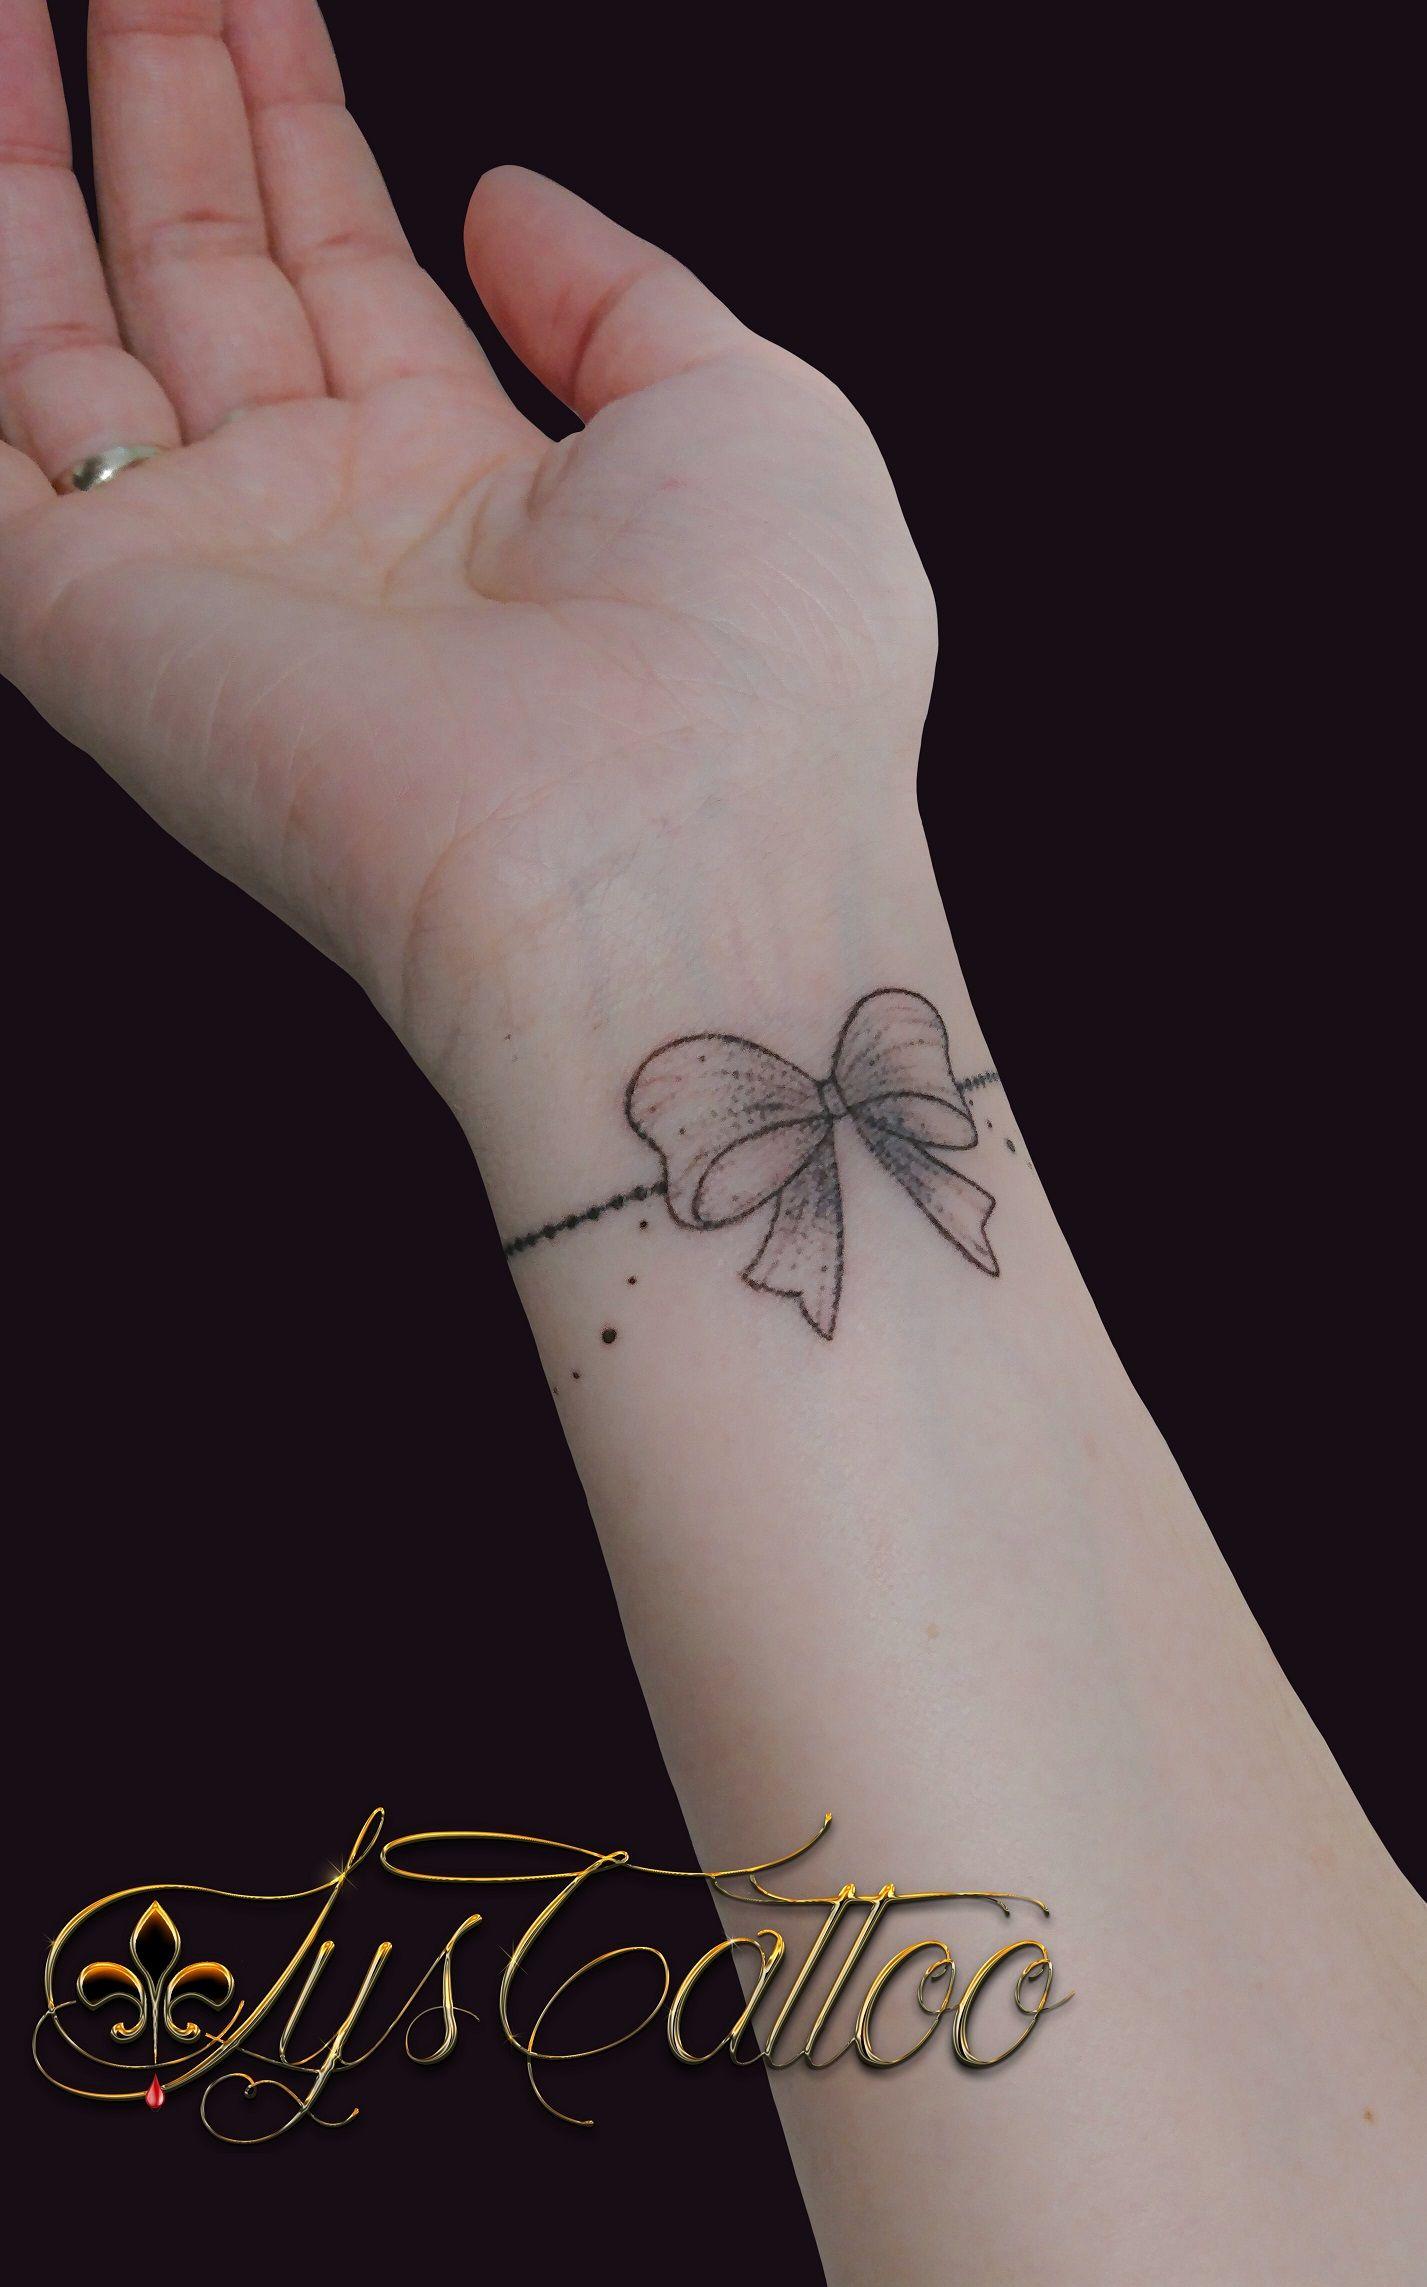 Tatouage Bracelet Femme Bijou Perles Petit Noeud Poignet Feminin